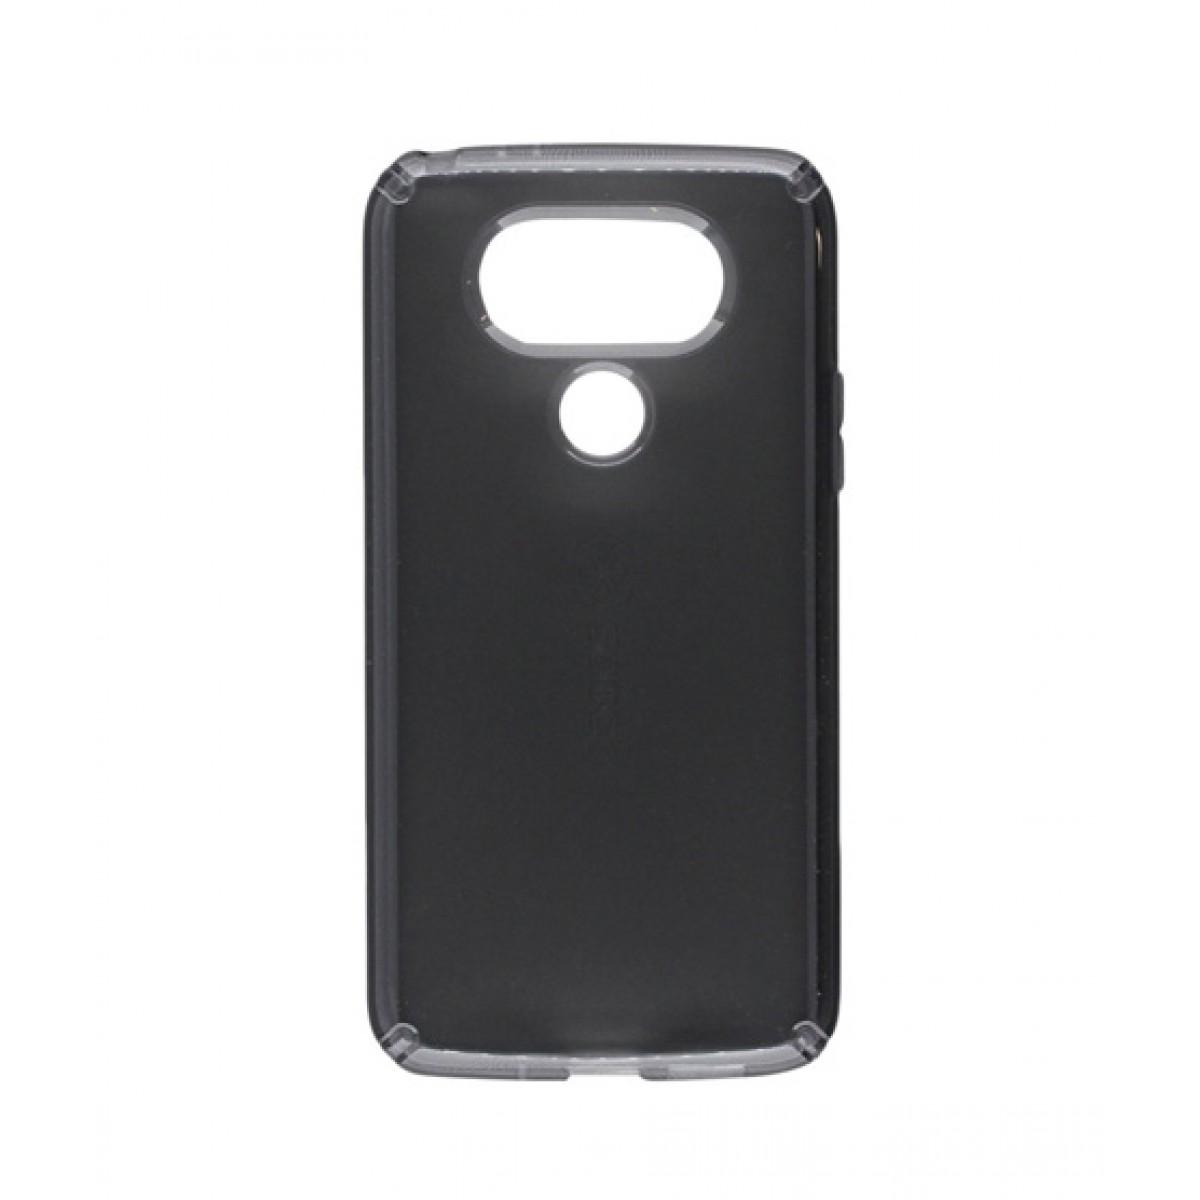 buy popular 9f530 4a060 Speck Candyshell Onyx Case Black For LG G5